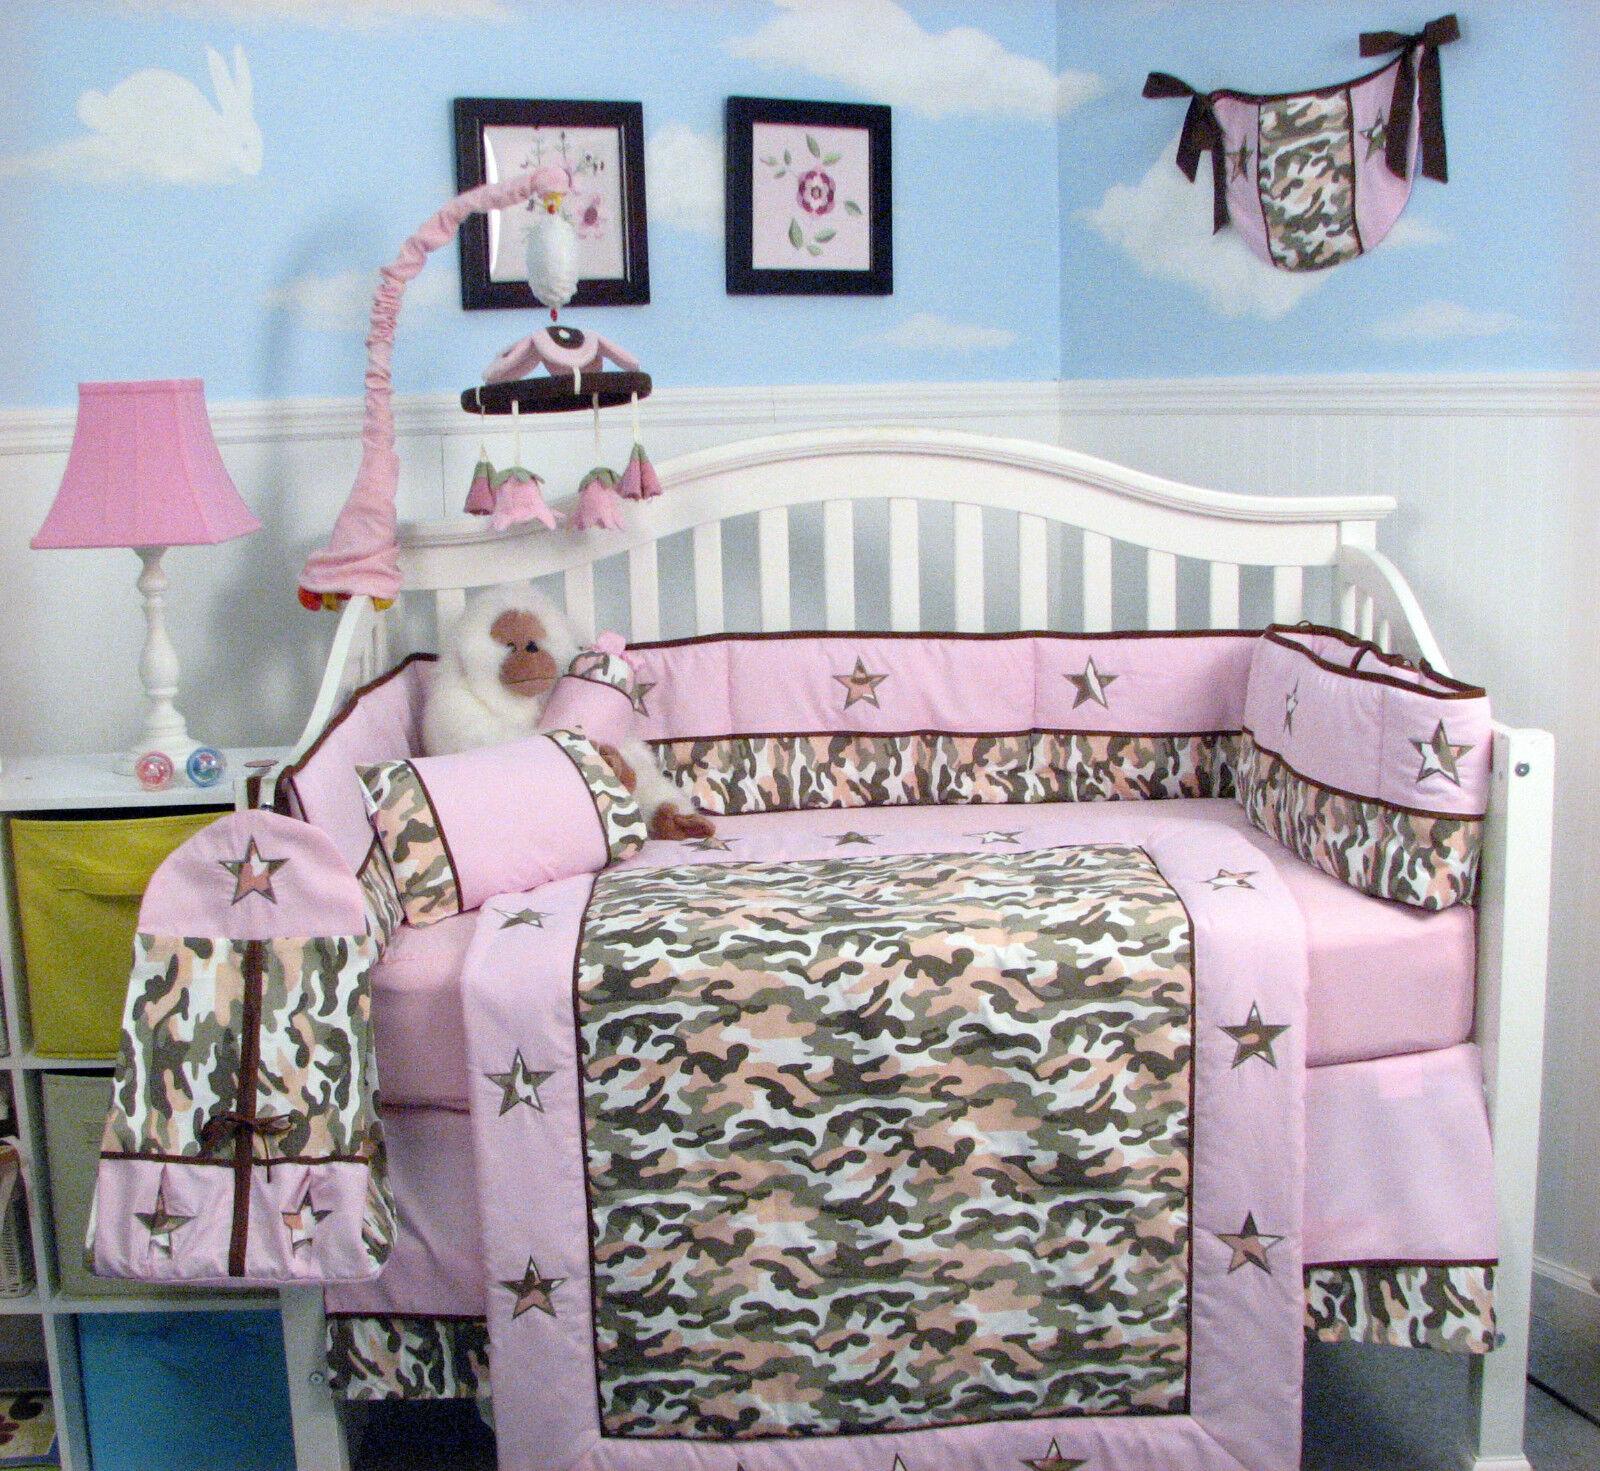 Khaki /& Light Pink Camo Baby Crib Nursery Bedding 13 pcs Set included Diaper Bag